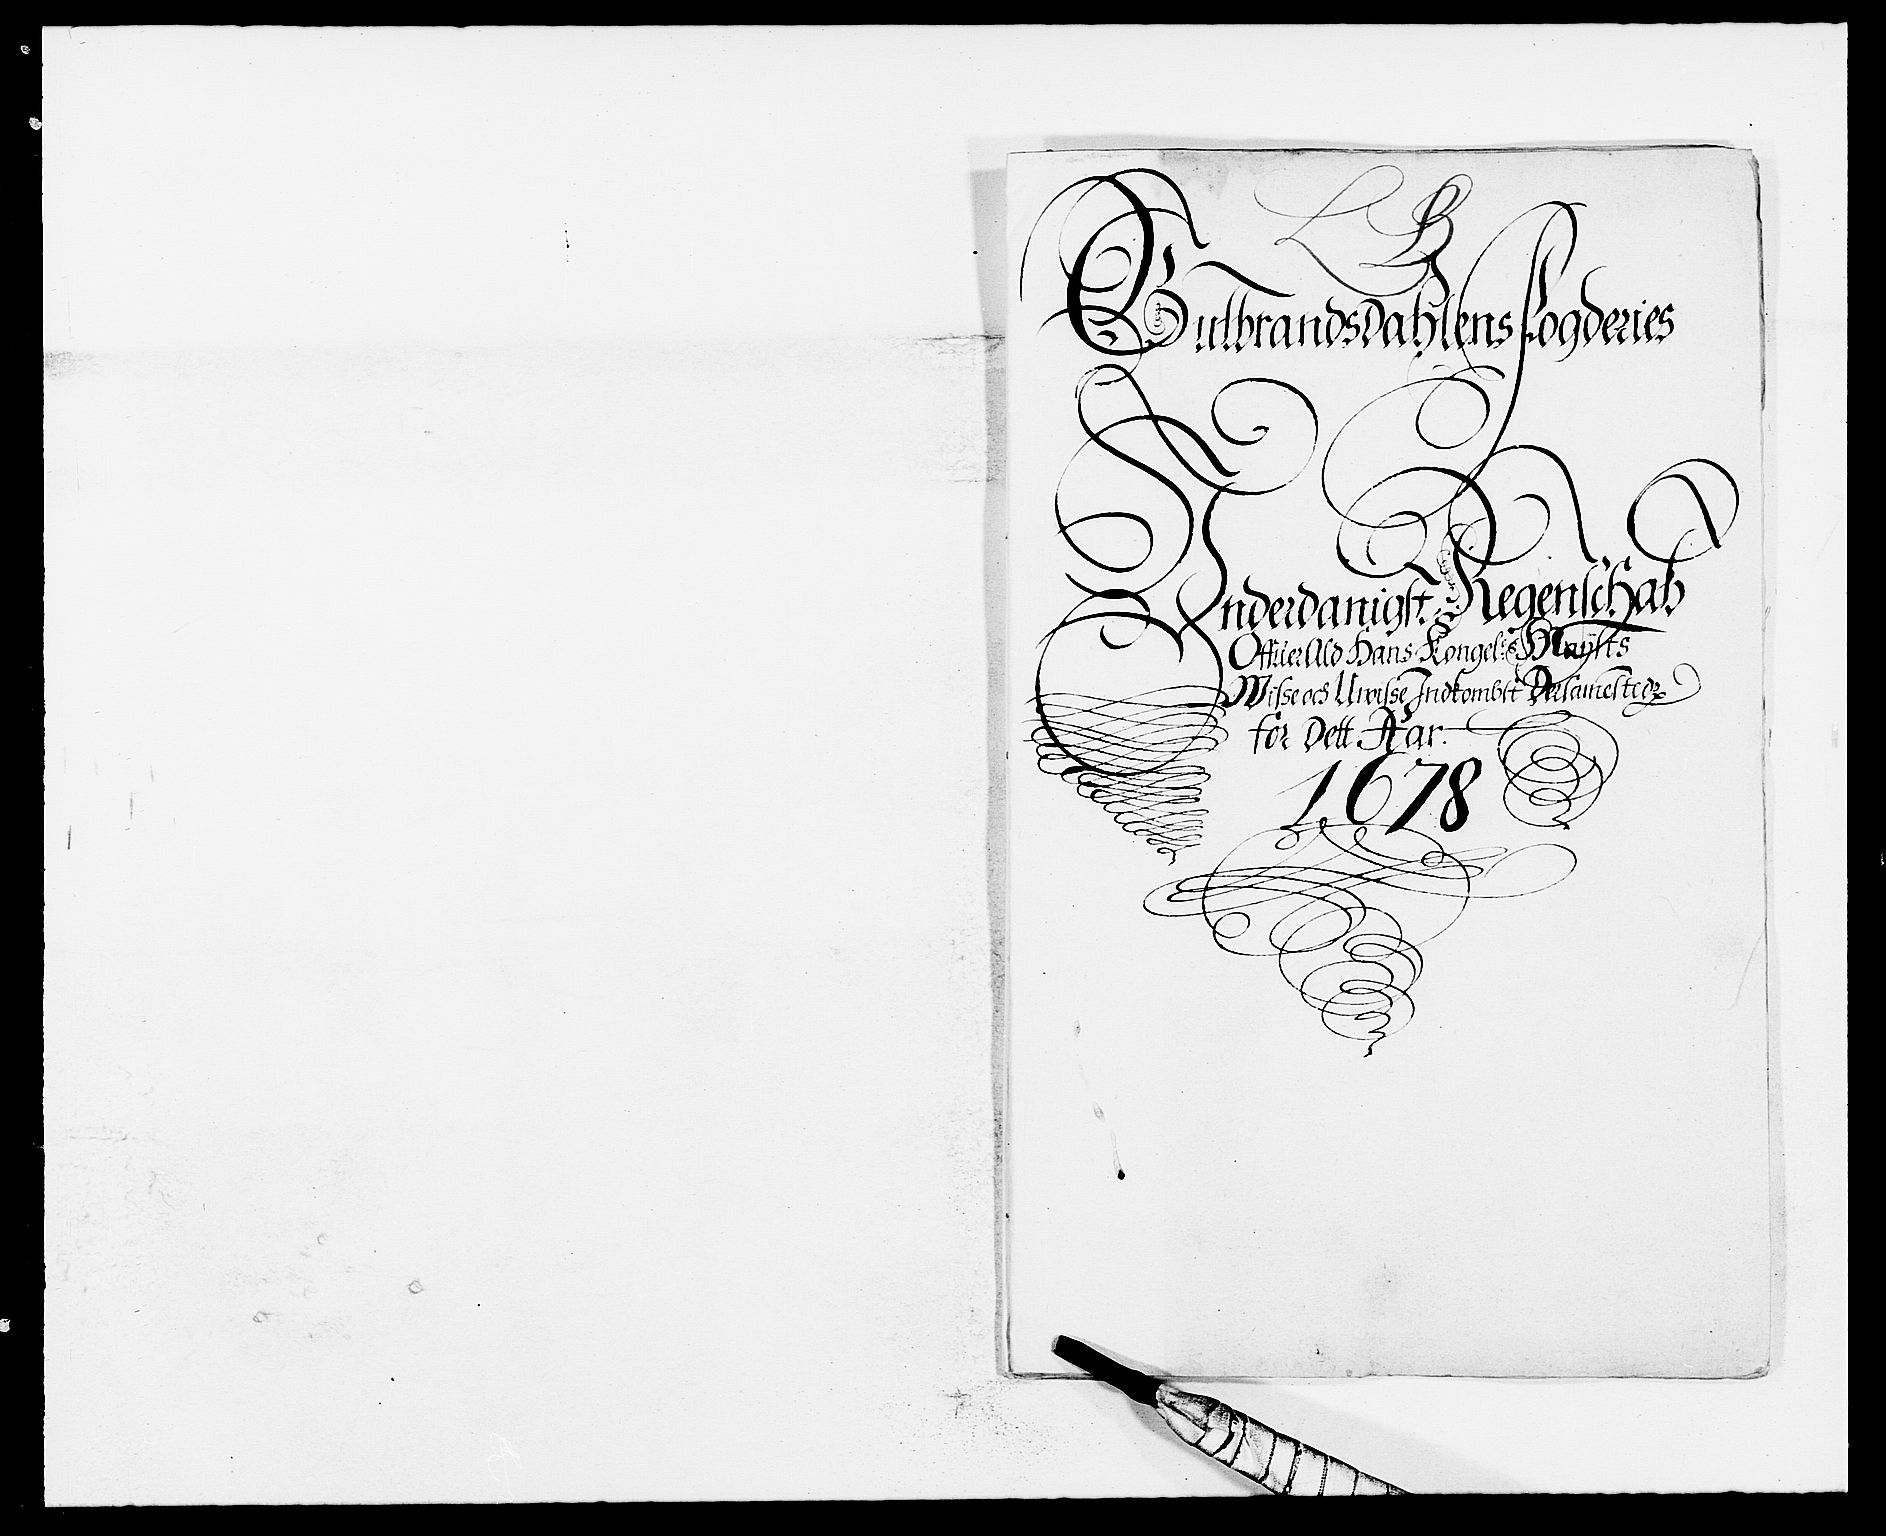 RA, Rentekammeret inntil 1814, Reviderte regnskaper, Fogderegnskap, R17/L1152: Fogderegnskap Gudbrandsdal, 1678-1679, s. 187